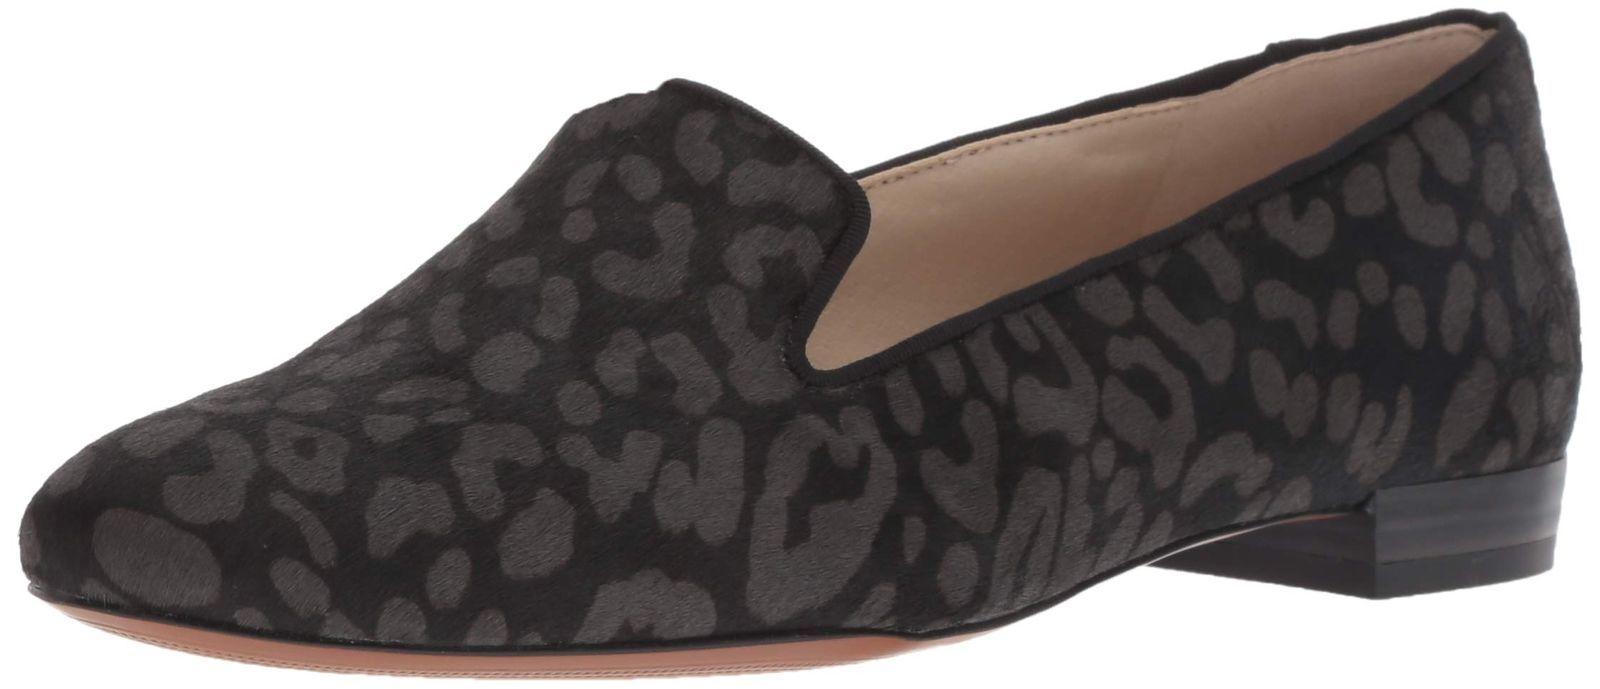 004591e358f Sam Edelman Women s Jordy Loafer Black Grey Cheetah 10 M US -  83.84